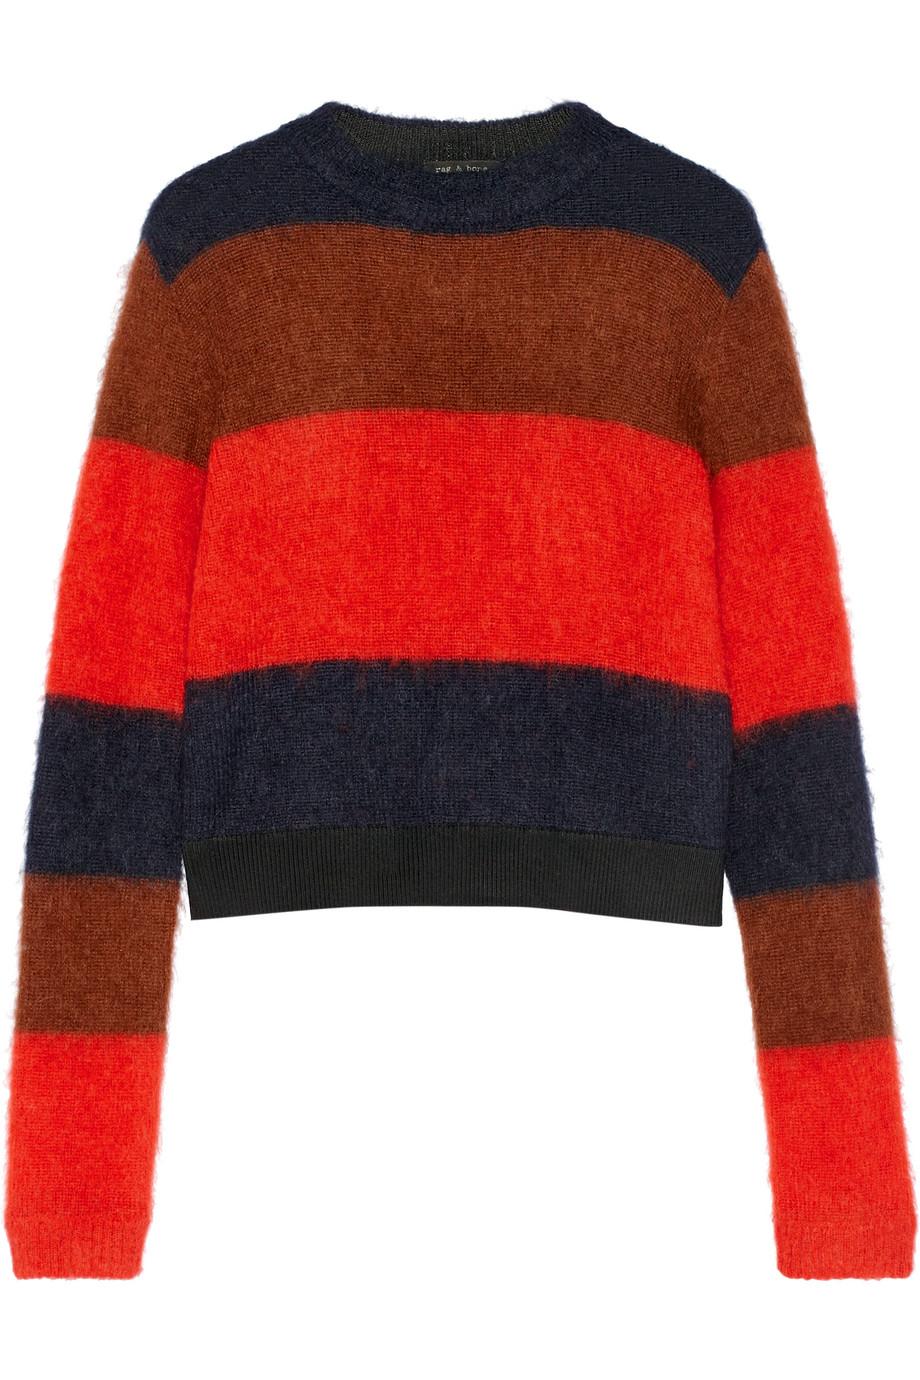 Rag & Bone Petra Striped Knitted Sweater, Crimson, Women's